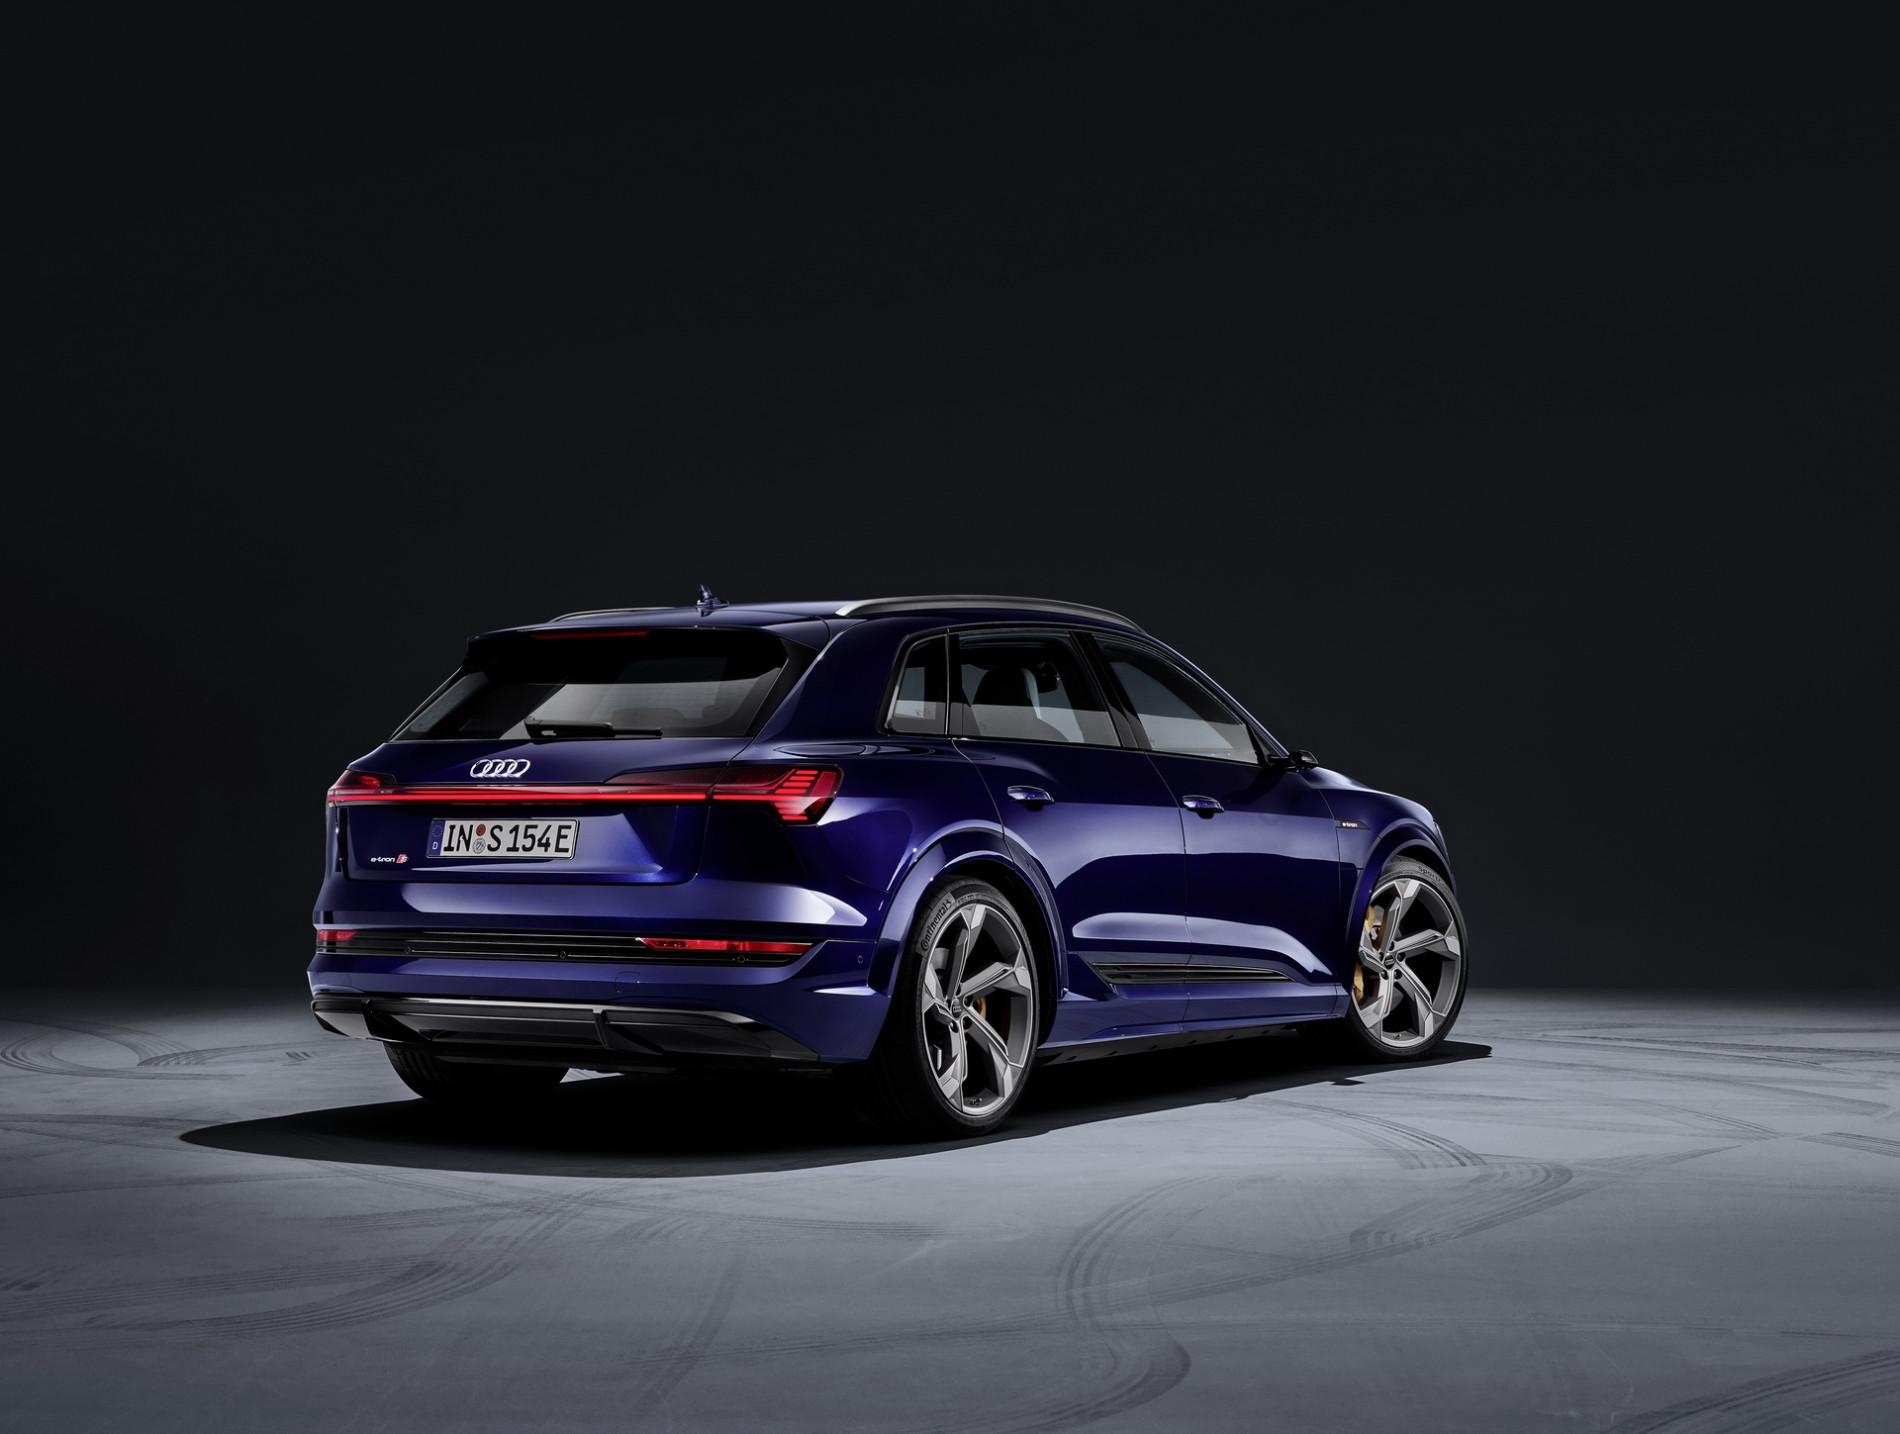 Audi E-Tron S - Audi E-Tron S